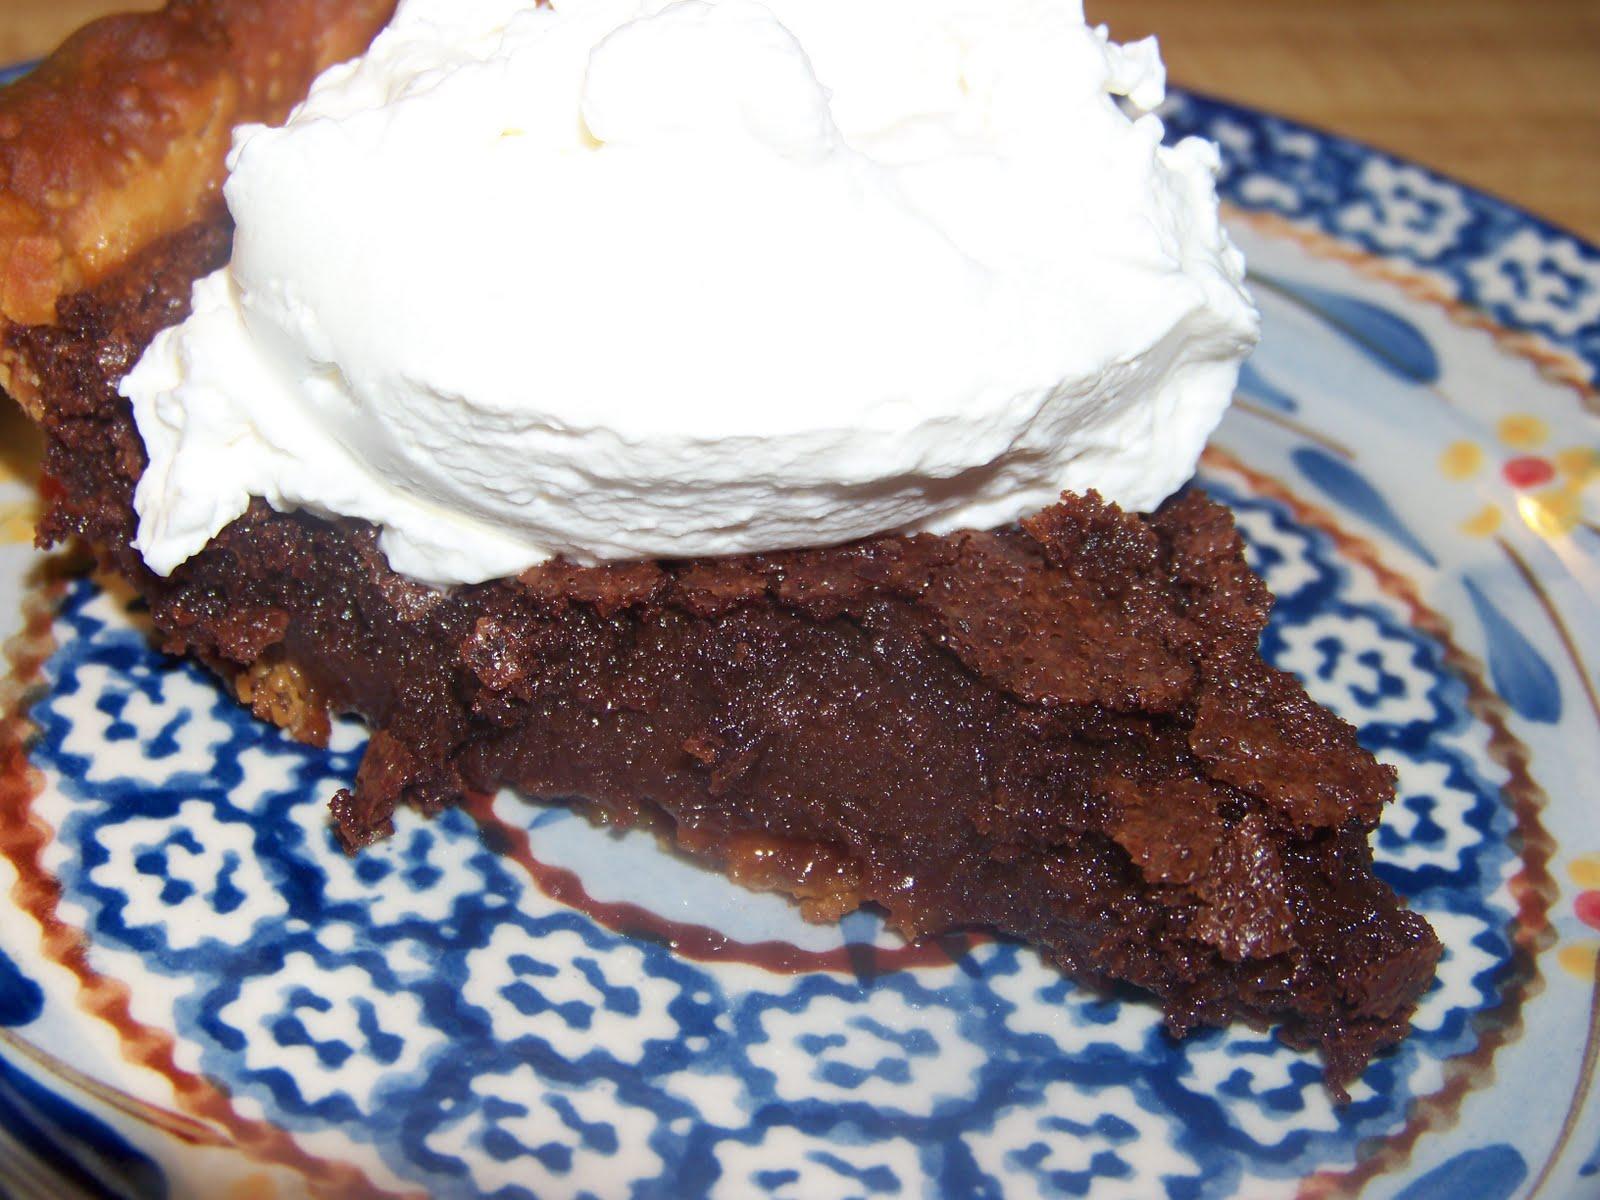 fudge school fudge tart chocolate fudge tart bourbon fudge tart ...